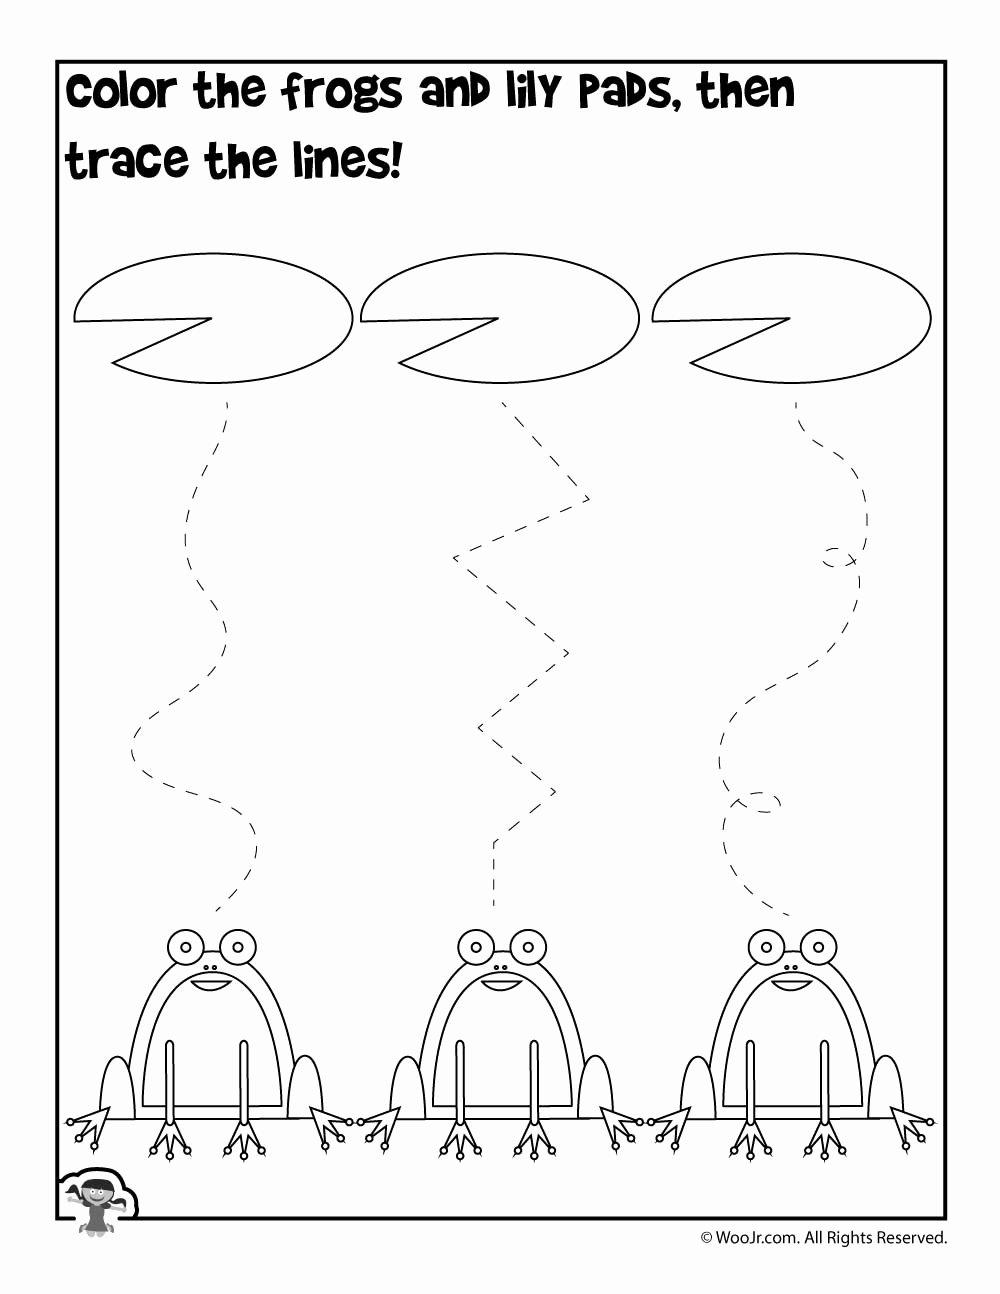 Spring Tracing Worksheets for Preschoolers Unique Spring Tracing Preschool Worksheet